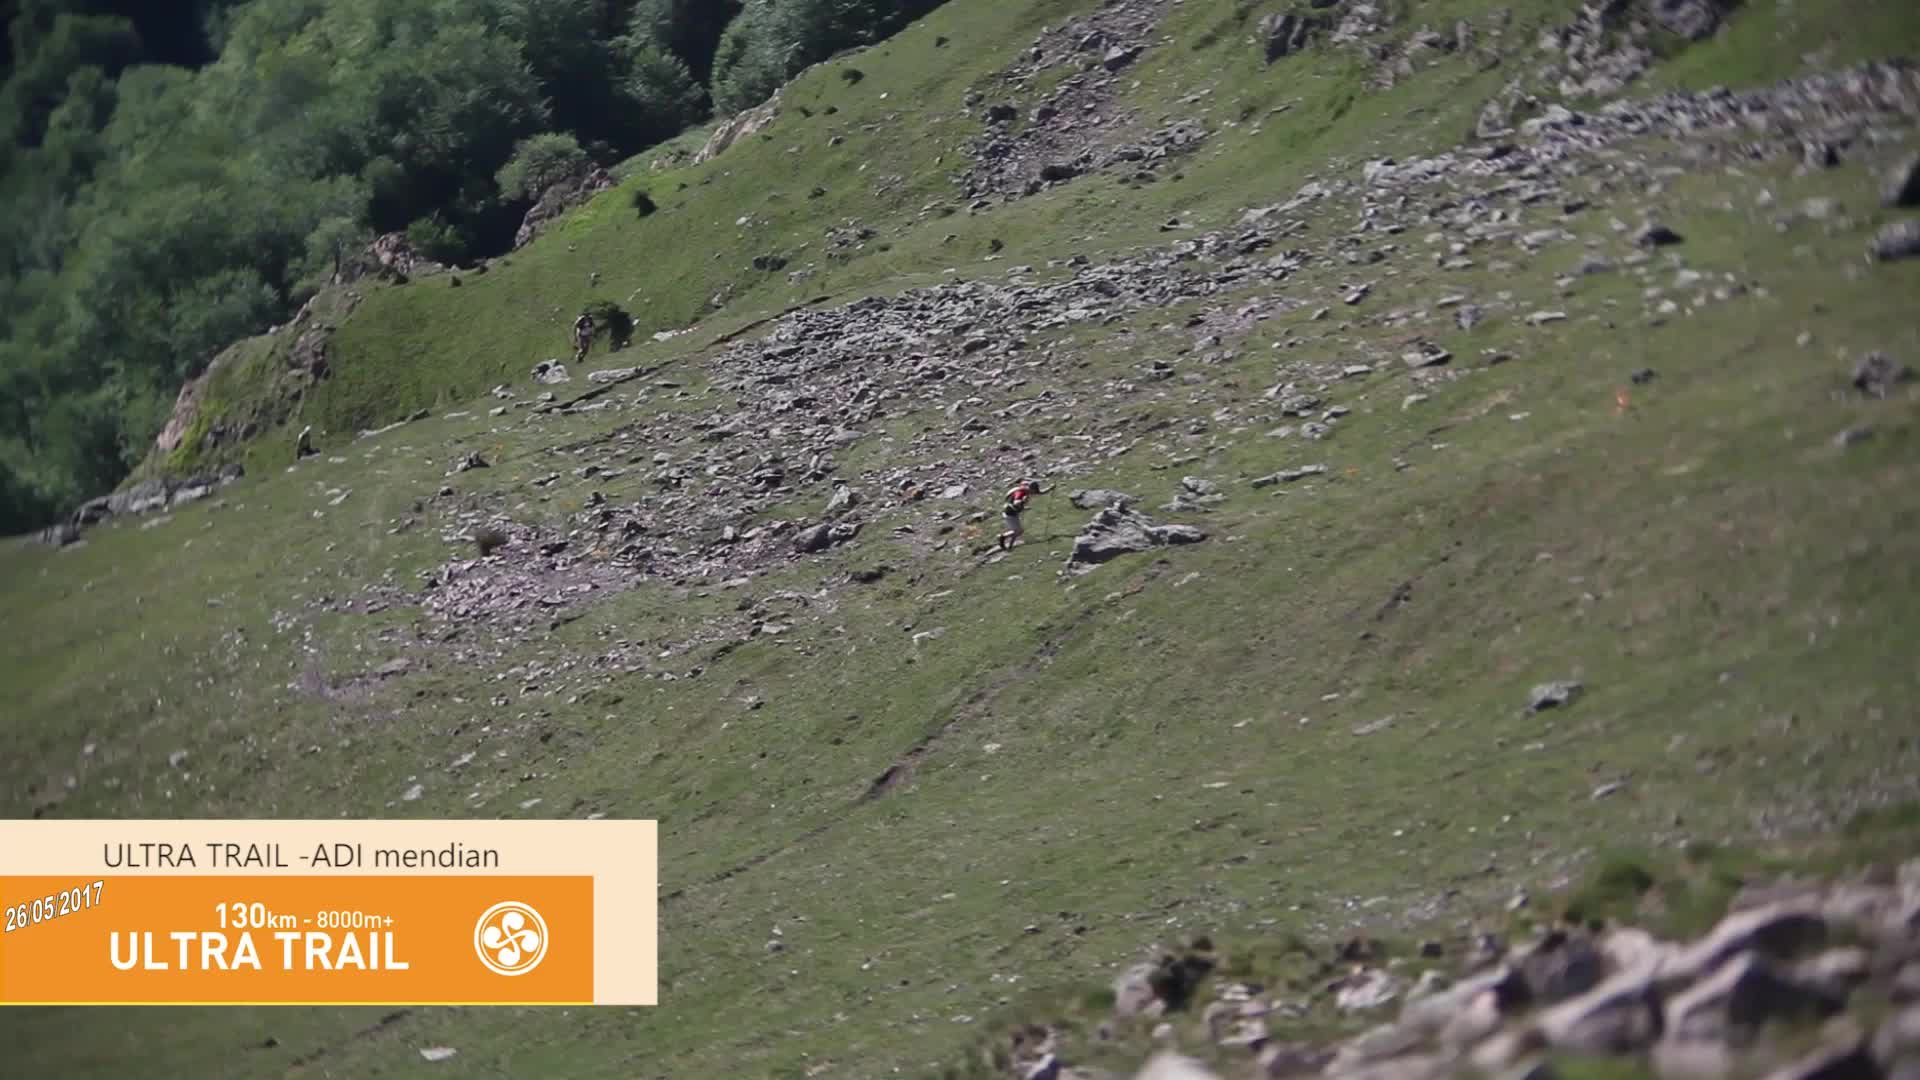 Euskal TRail  2017: ULTRA TRAIL AHADI mendian